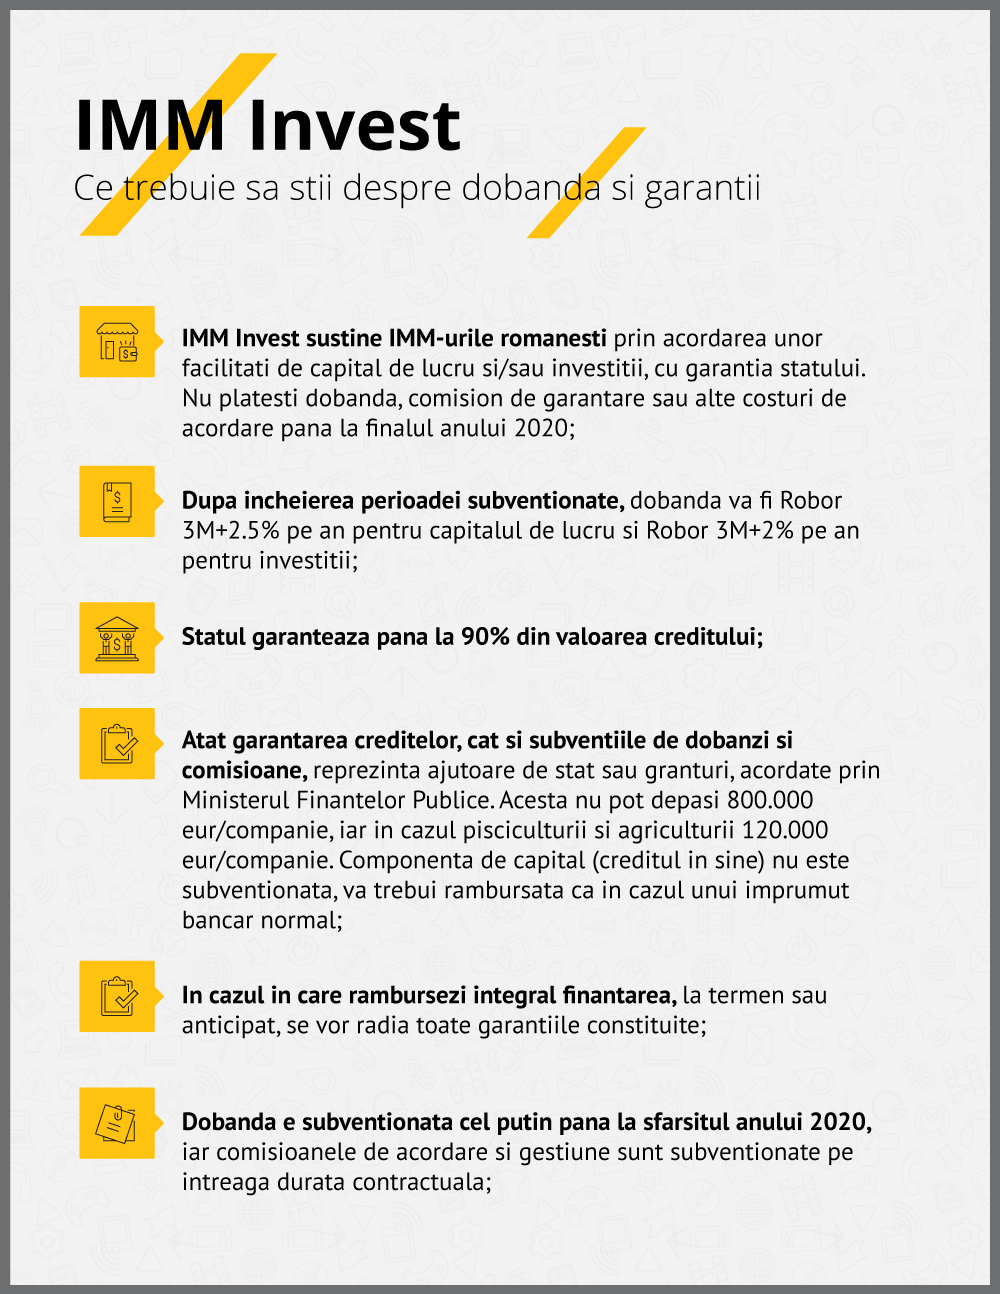 Infografic IMM Invest Ce trebuie sa stii despre dobanda si garantii